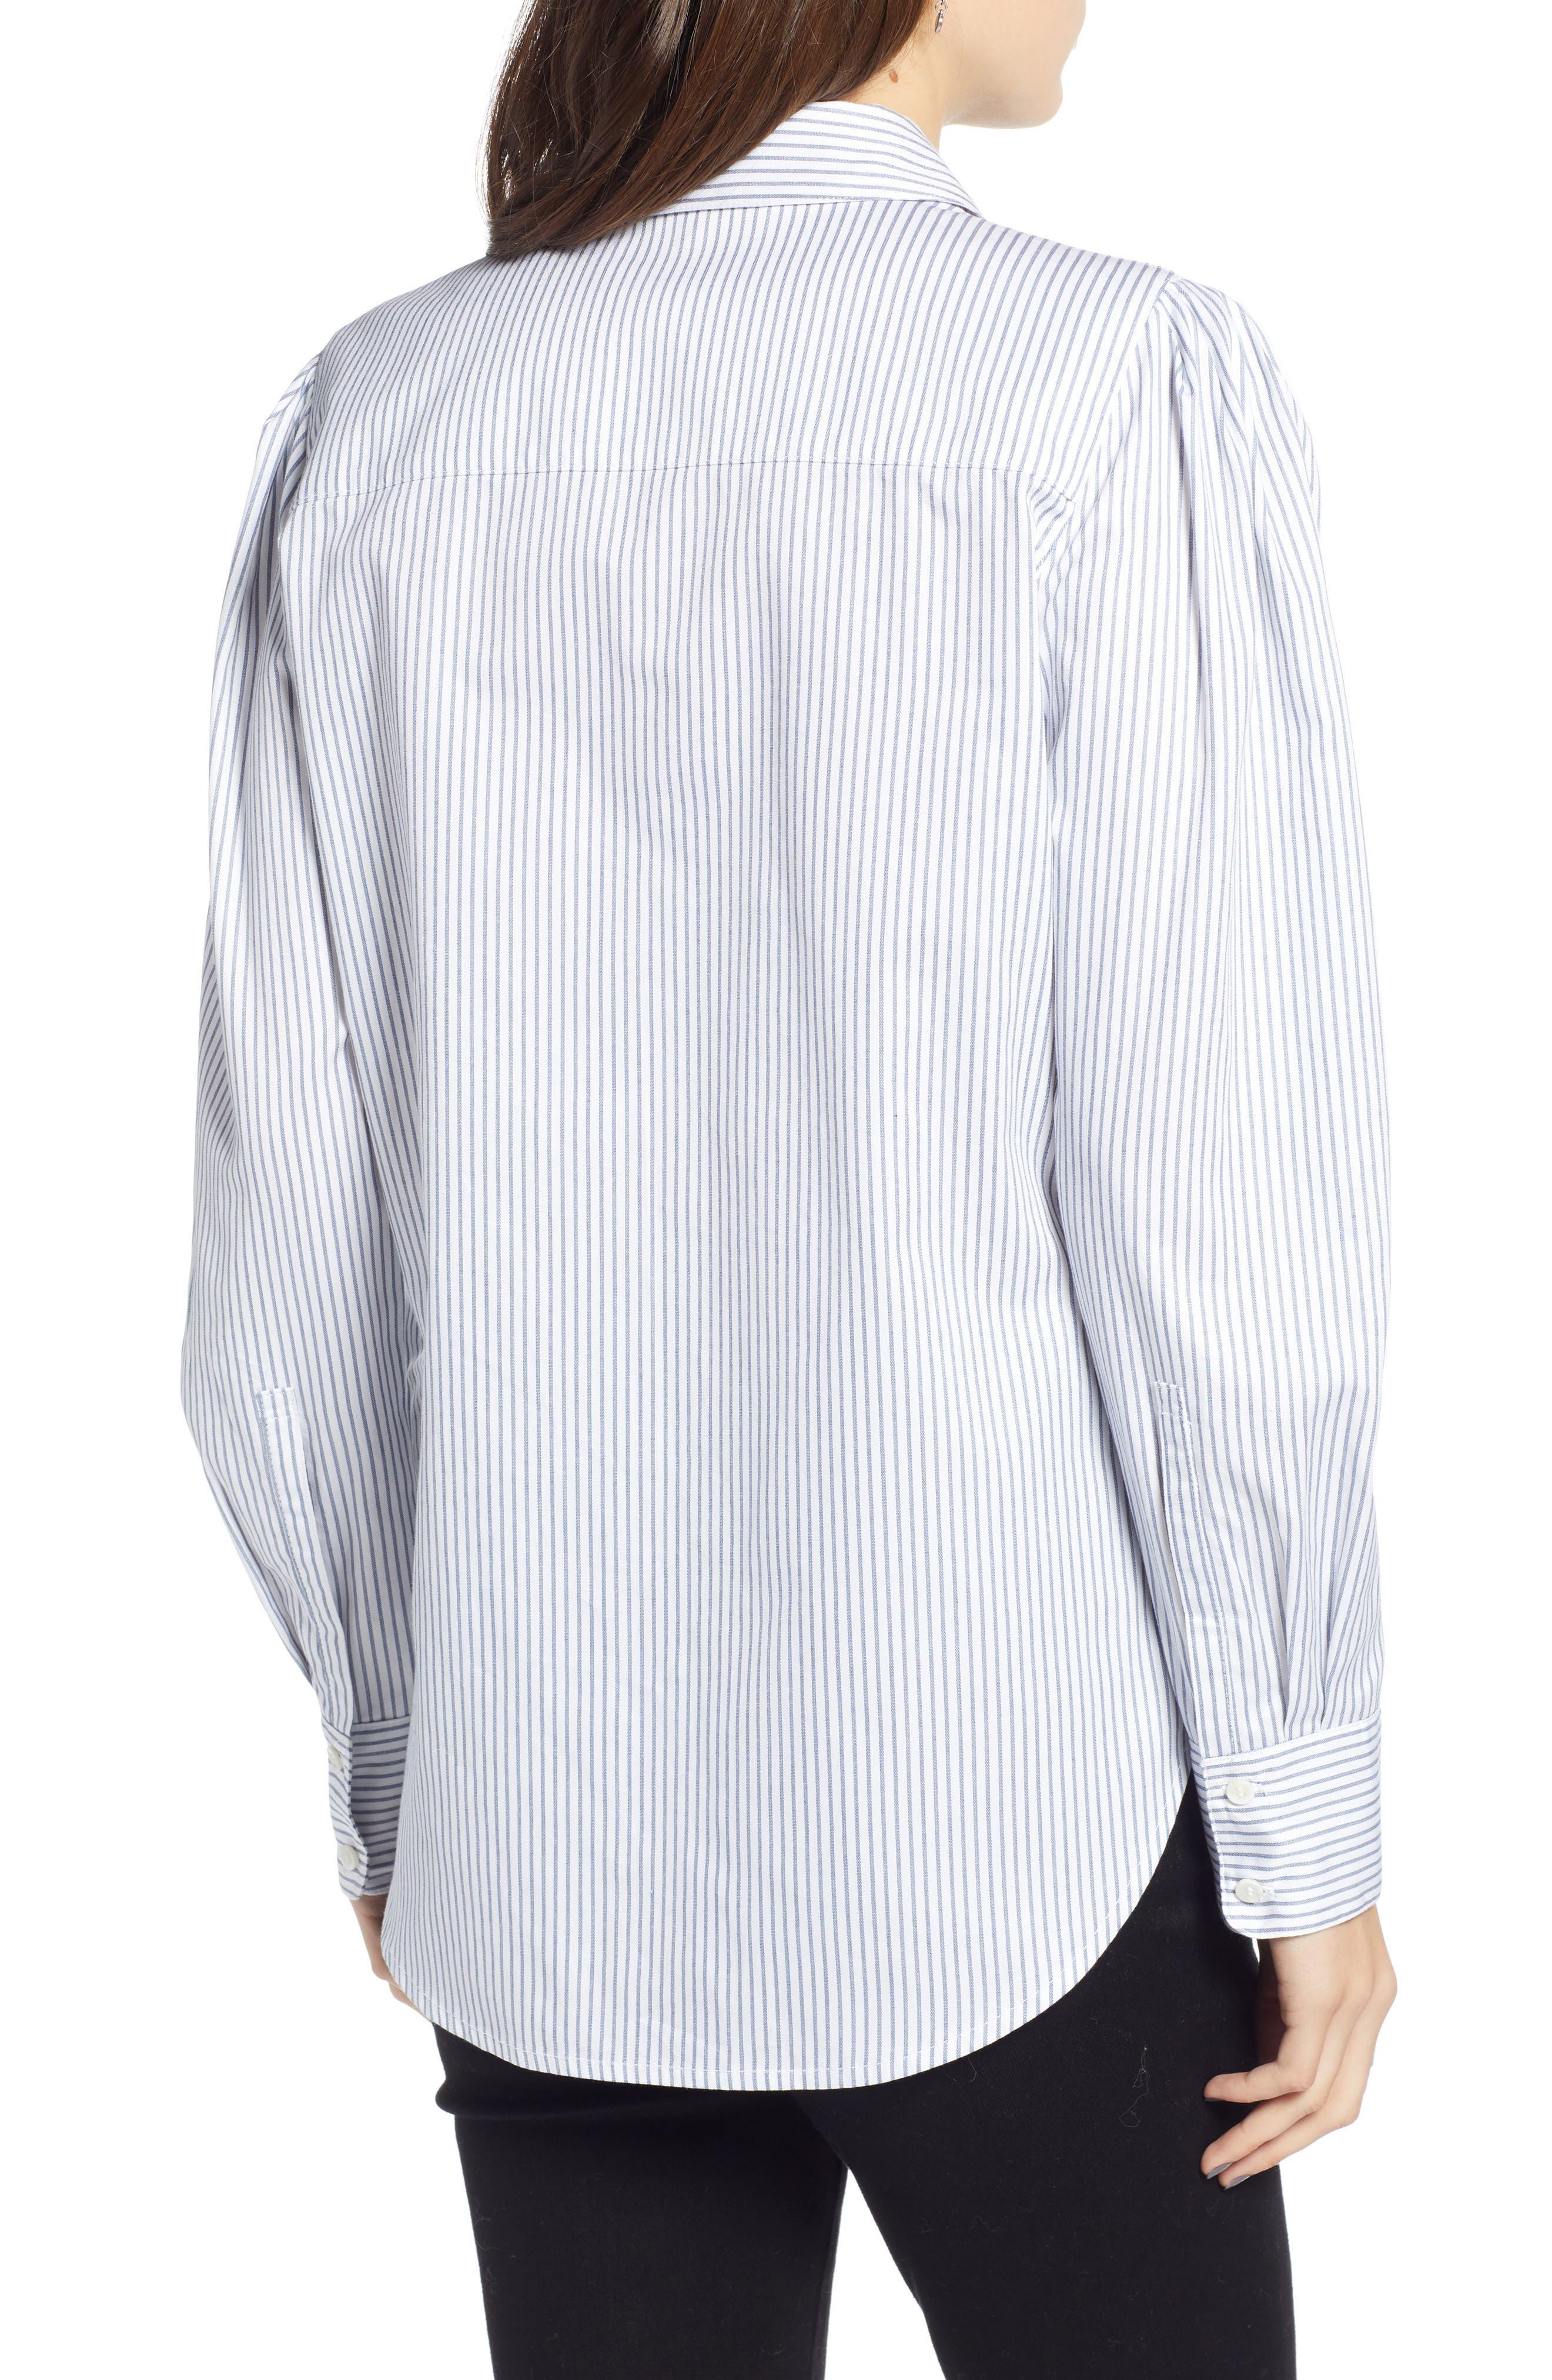 Pleated Sleeve Stripe Shirt,                             Alternate thumbnail 2, color,                             WHITE STOCKHOLM STRIPE